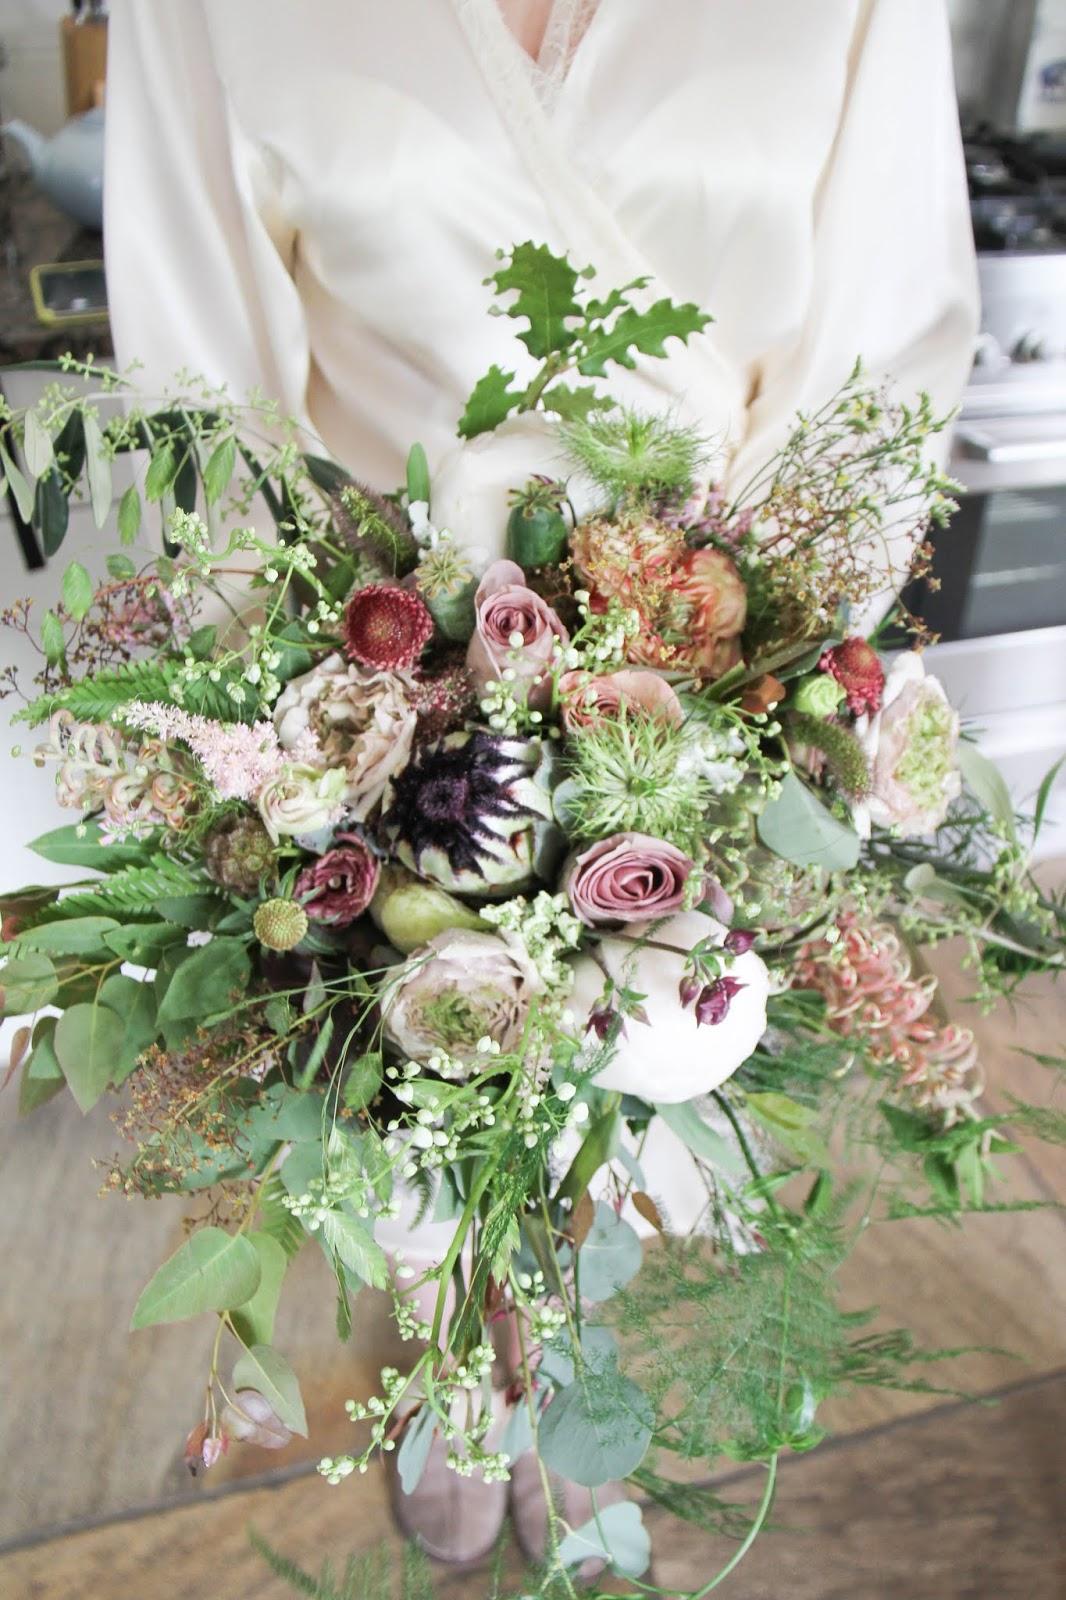 A Sneaky Peek At Ian Rebeccas Magical Whimsical Wedding Flowers